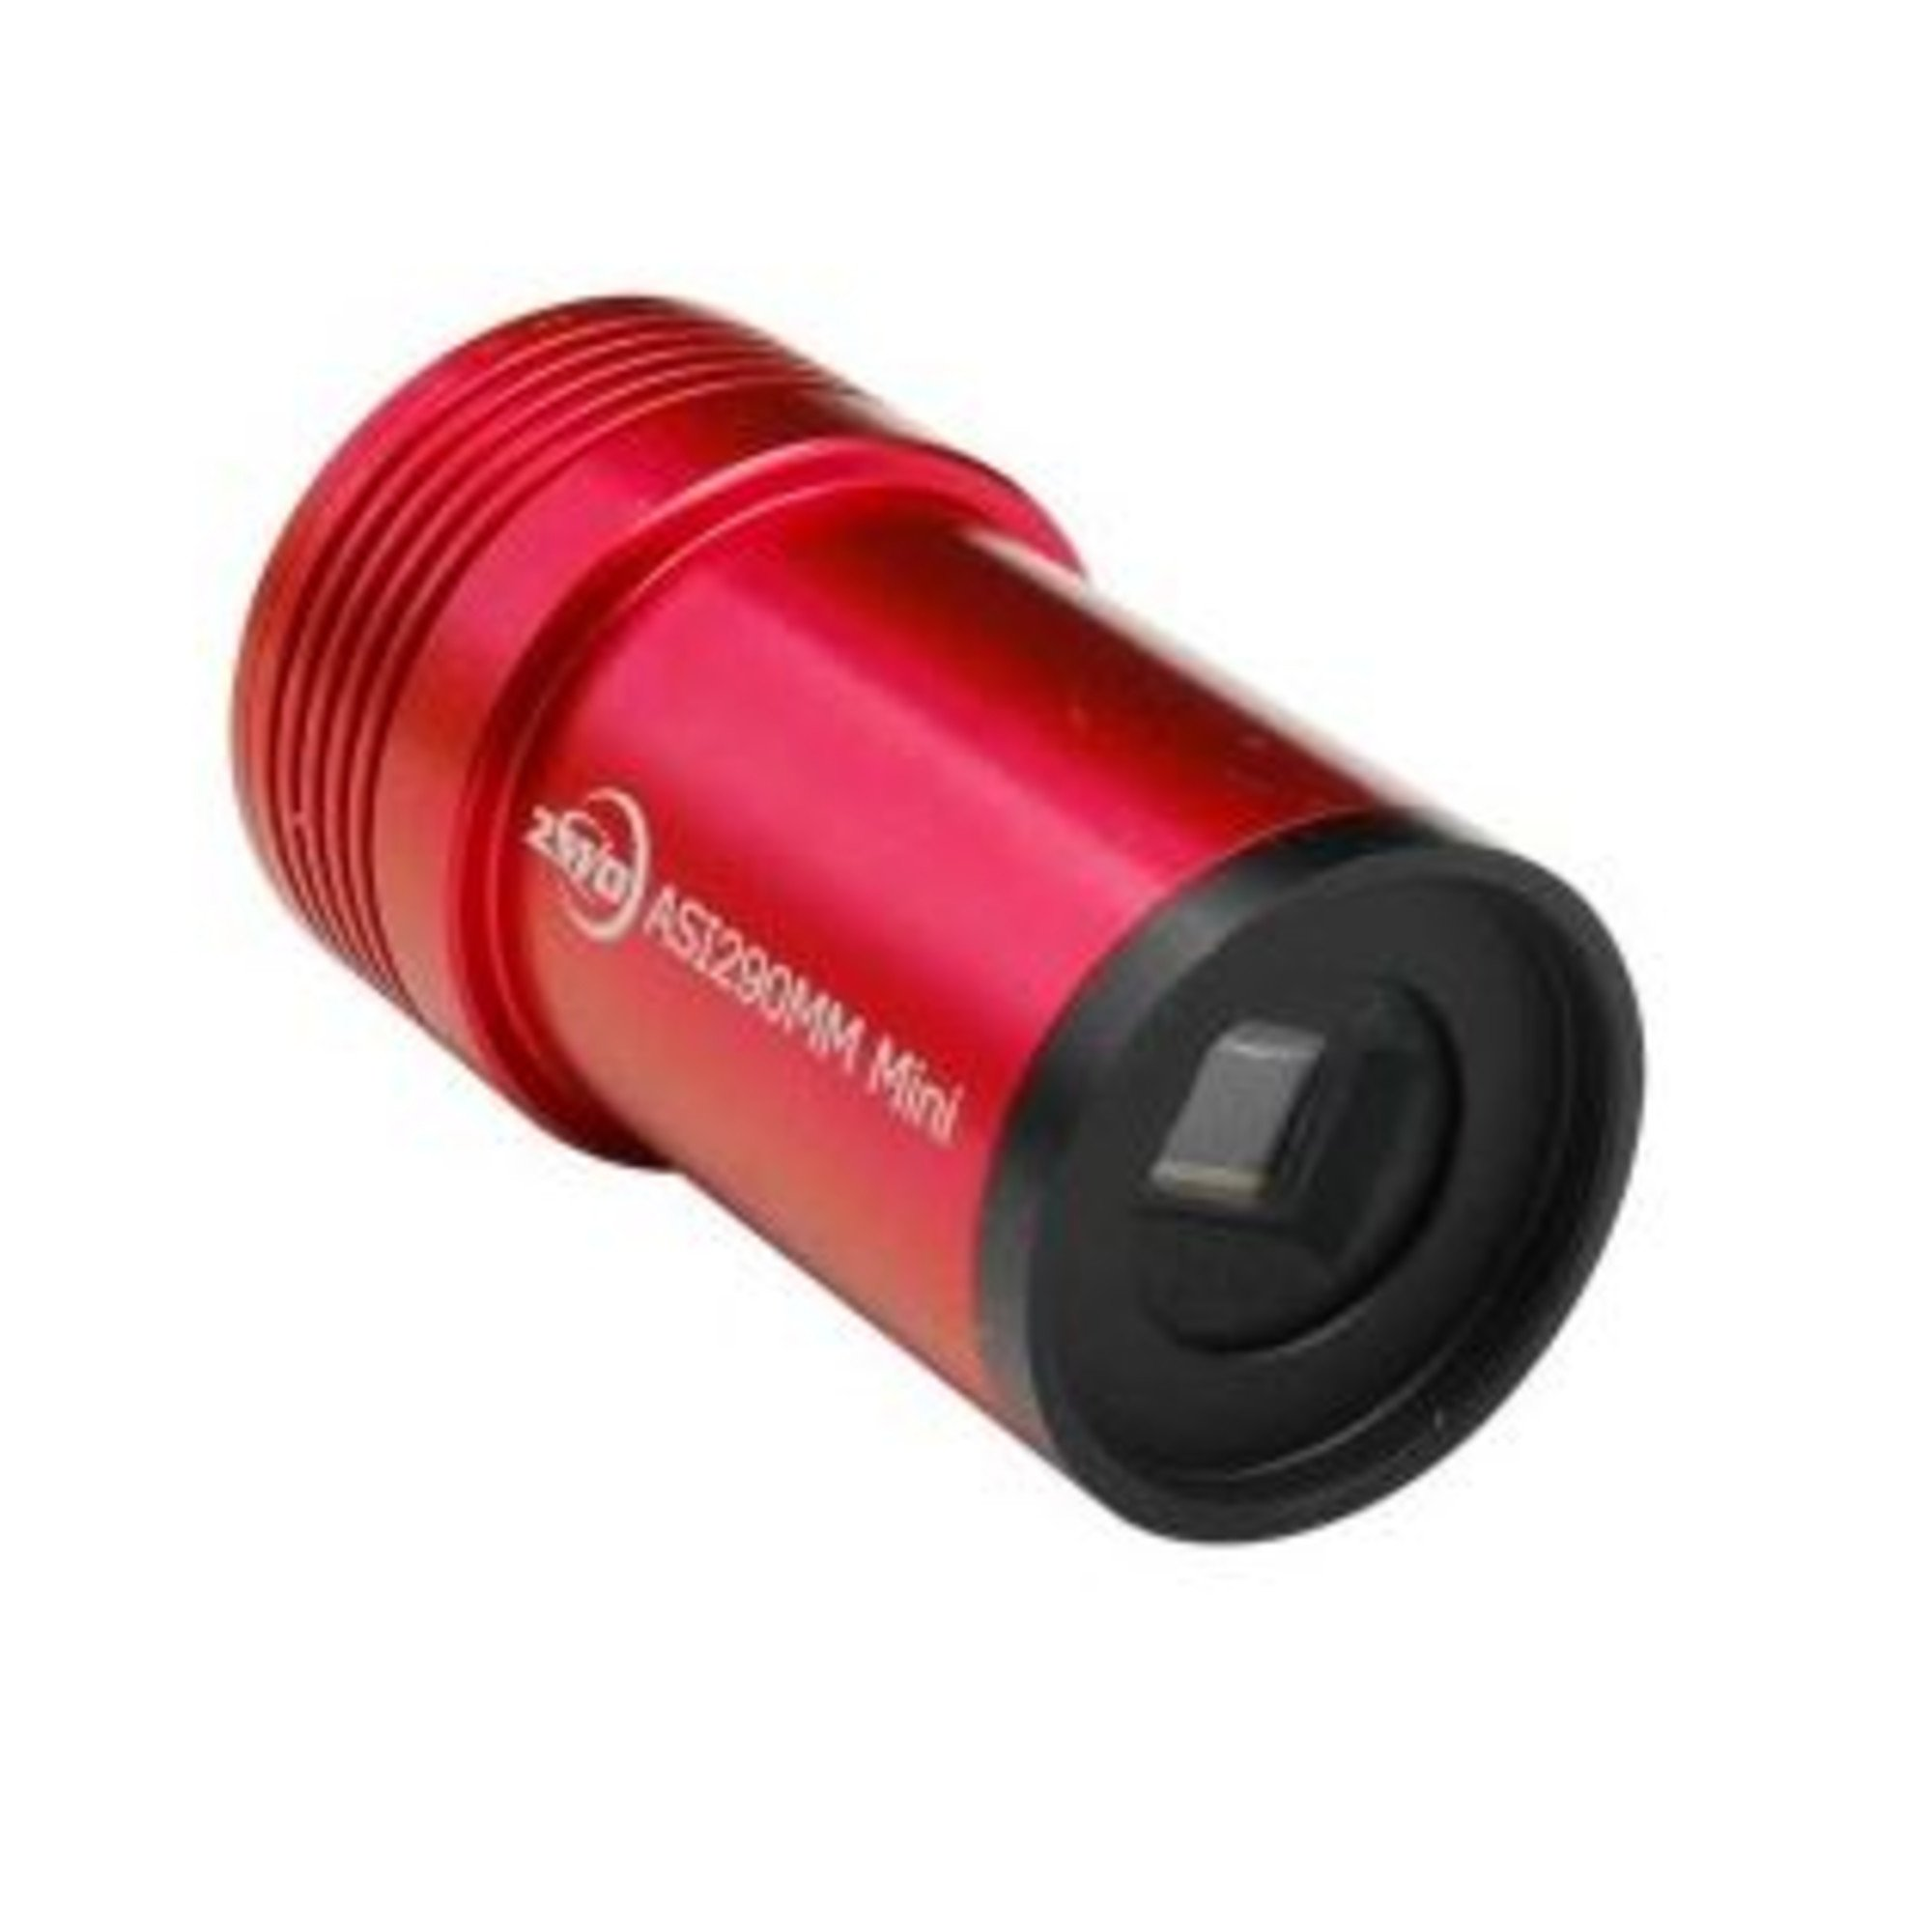 ZWO Optical ZWO ASI290MM-MINI 2.1 MP CMOS Monochrome Astronomy Camera with USB 2.0 # ASI290MM-MINI by ZWO Optical